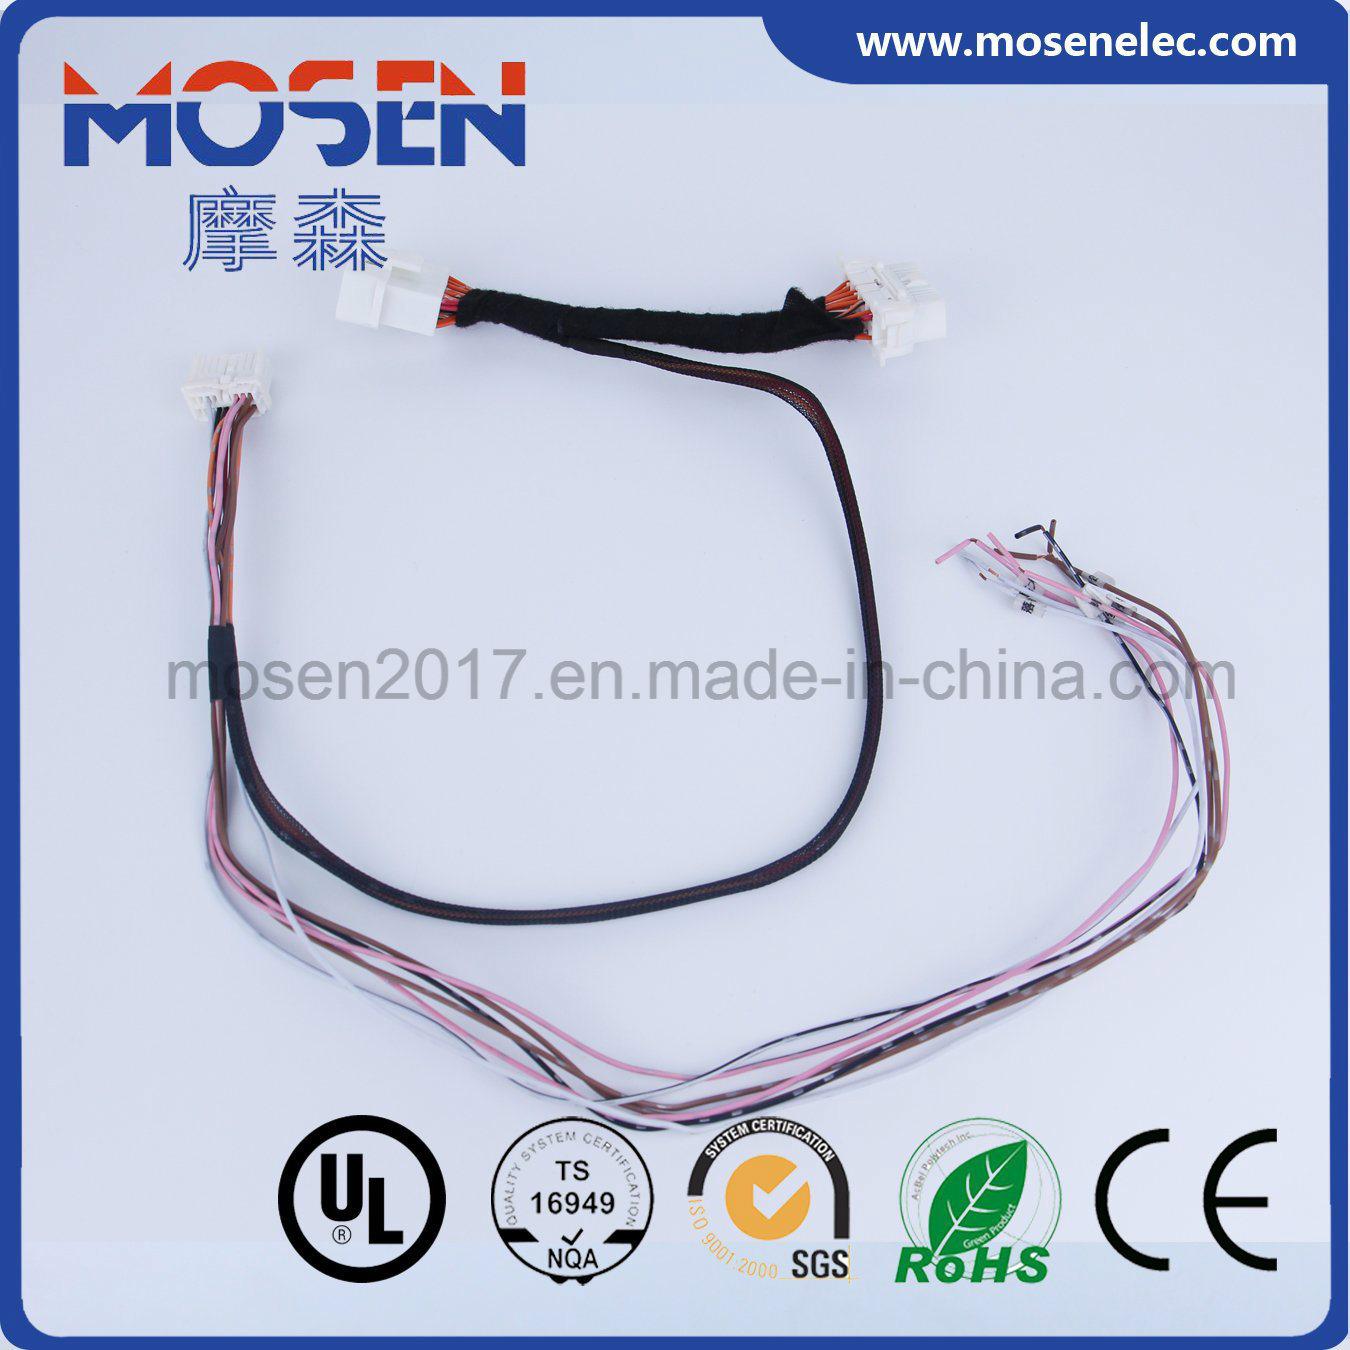 China Toyota Nissan Mazda Kia Hyundai Pke System Obd Connector Wiring Harness